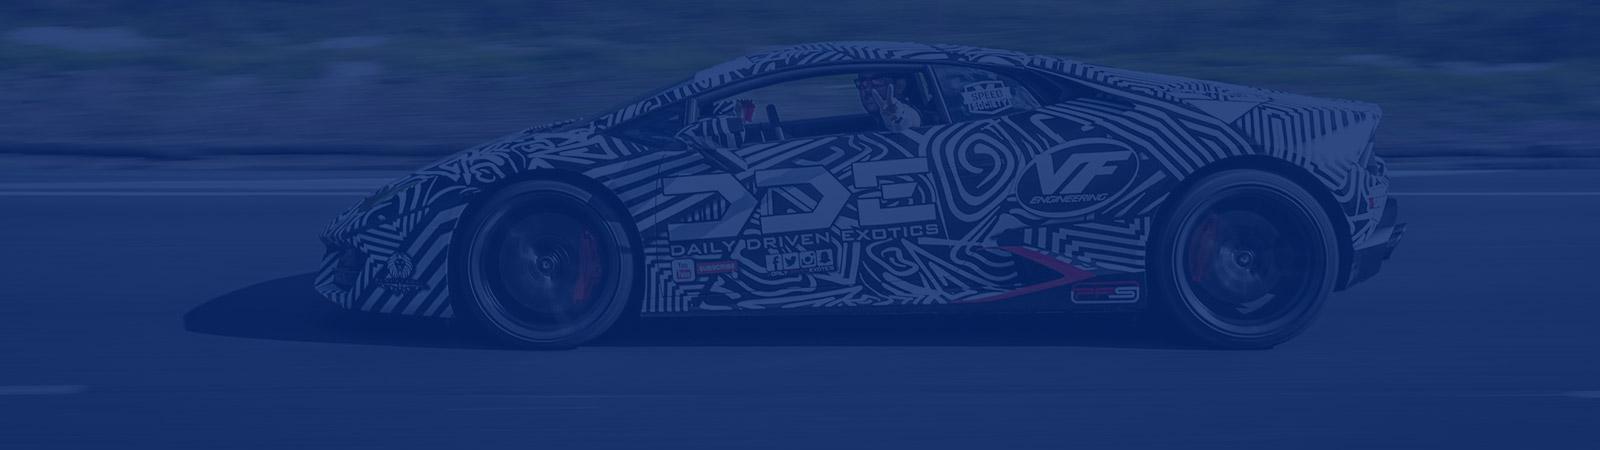 Daily Driven Exotics Lamborghini Huracan Wrap